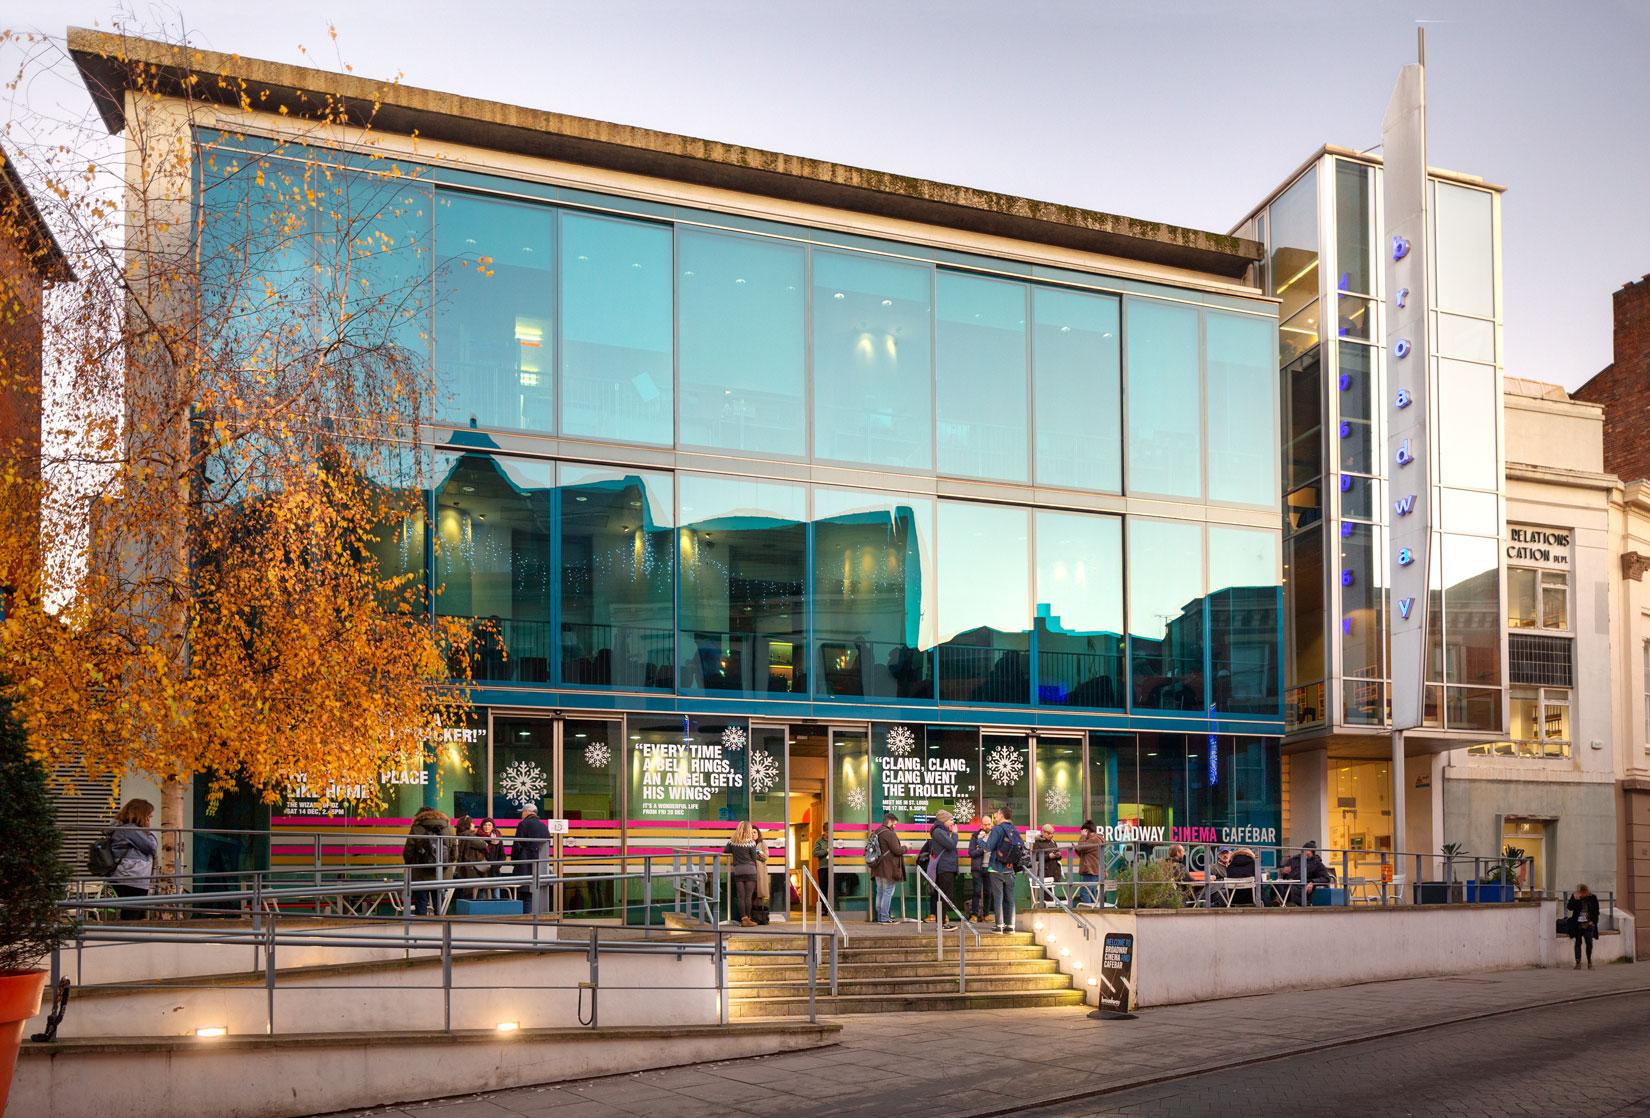 Nottingham Architecture photography, the broadway cinema